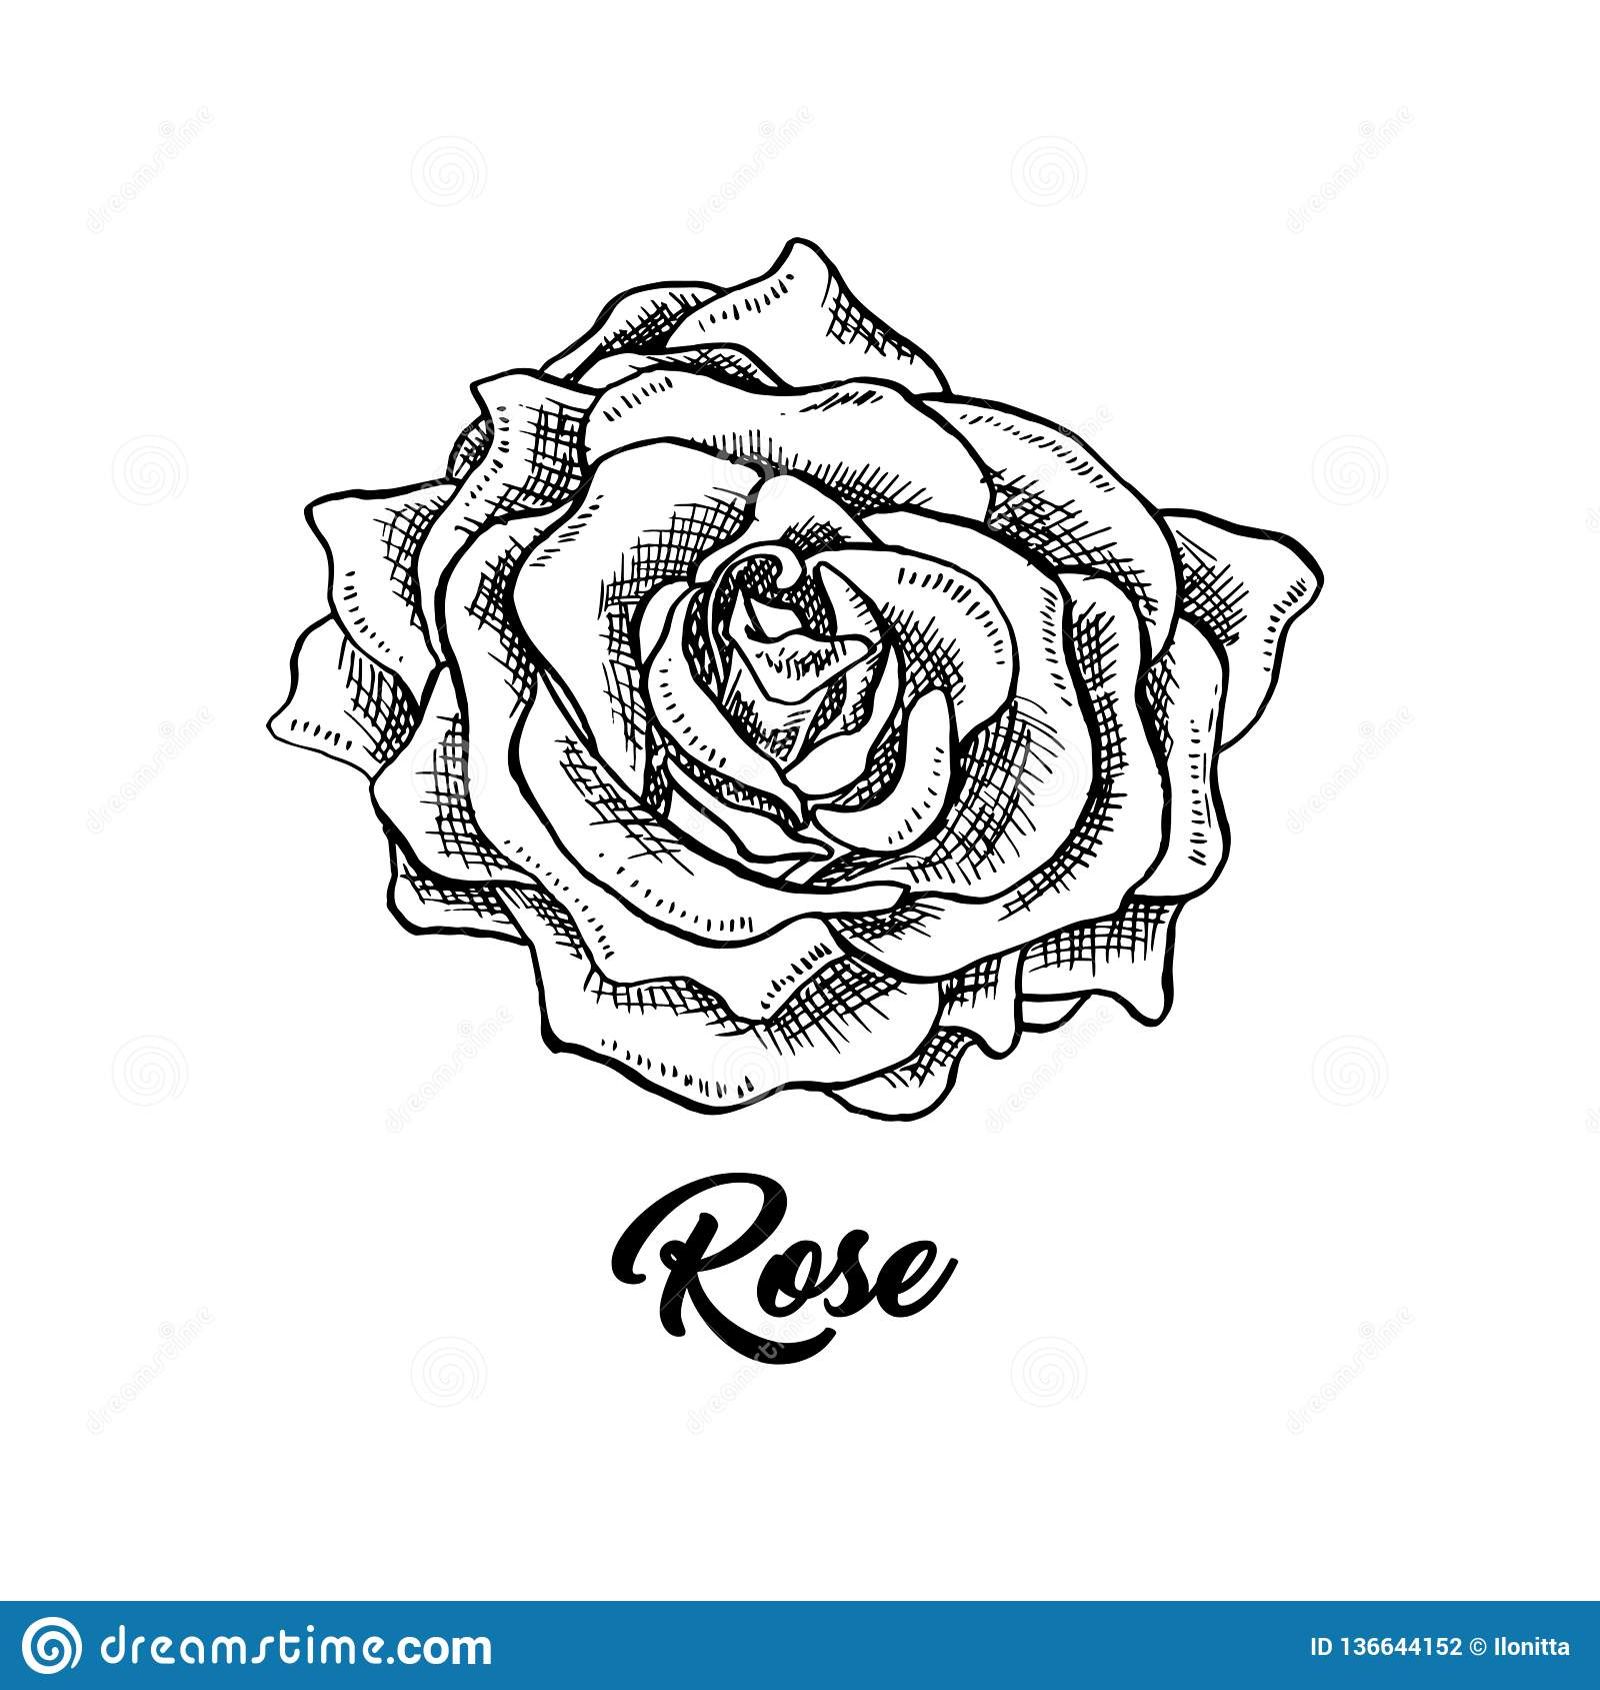 Rose Wine Flower Hand Drawn Ink Pen Illustration Stock Vector Illustration Of Emblem Drawing 136644152